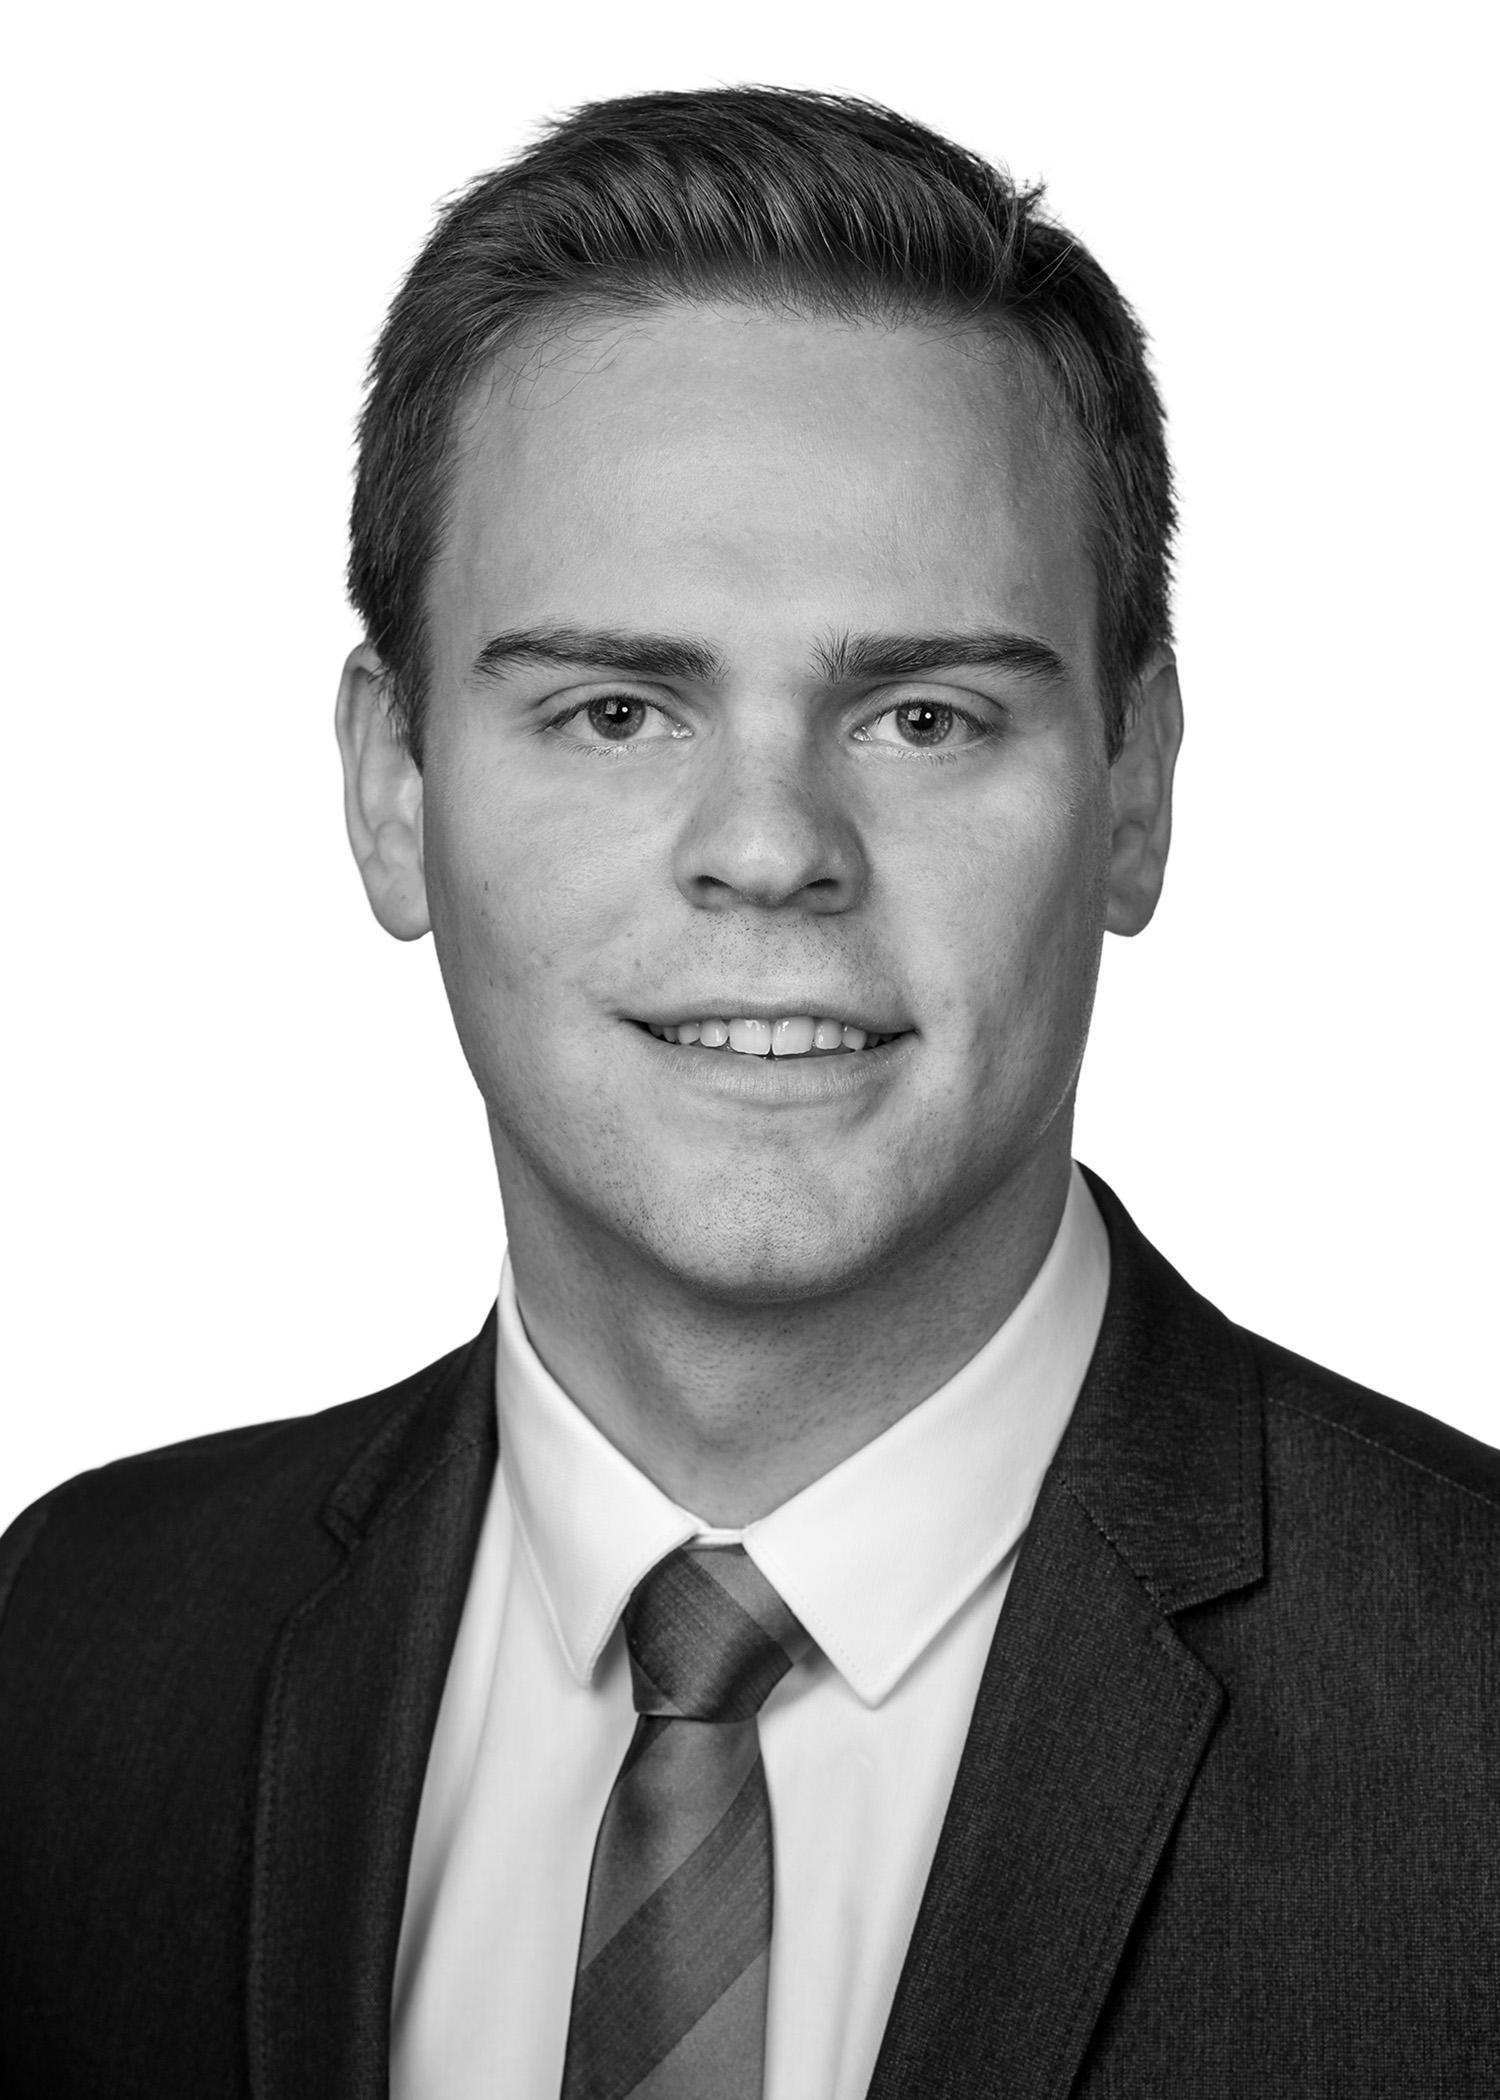 Jean-Philippe Mathieu, CFA